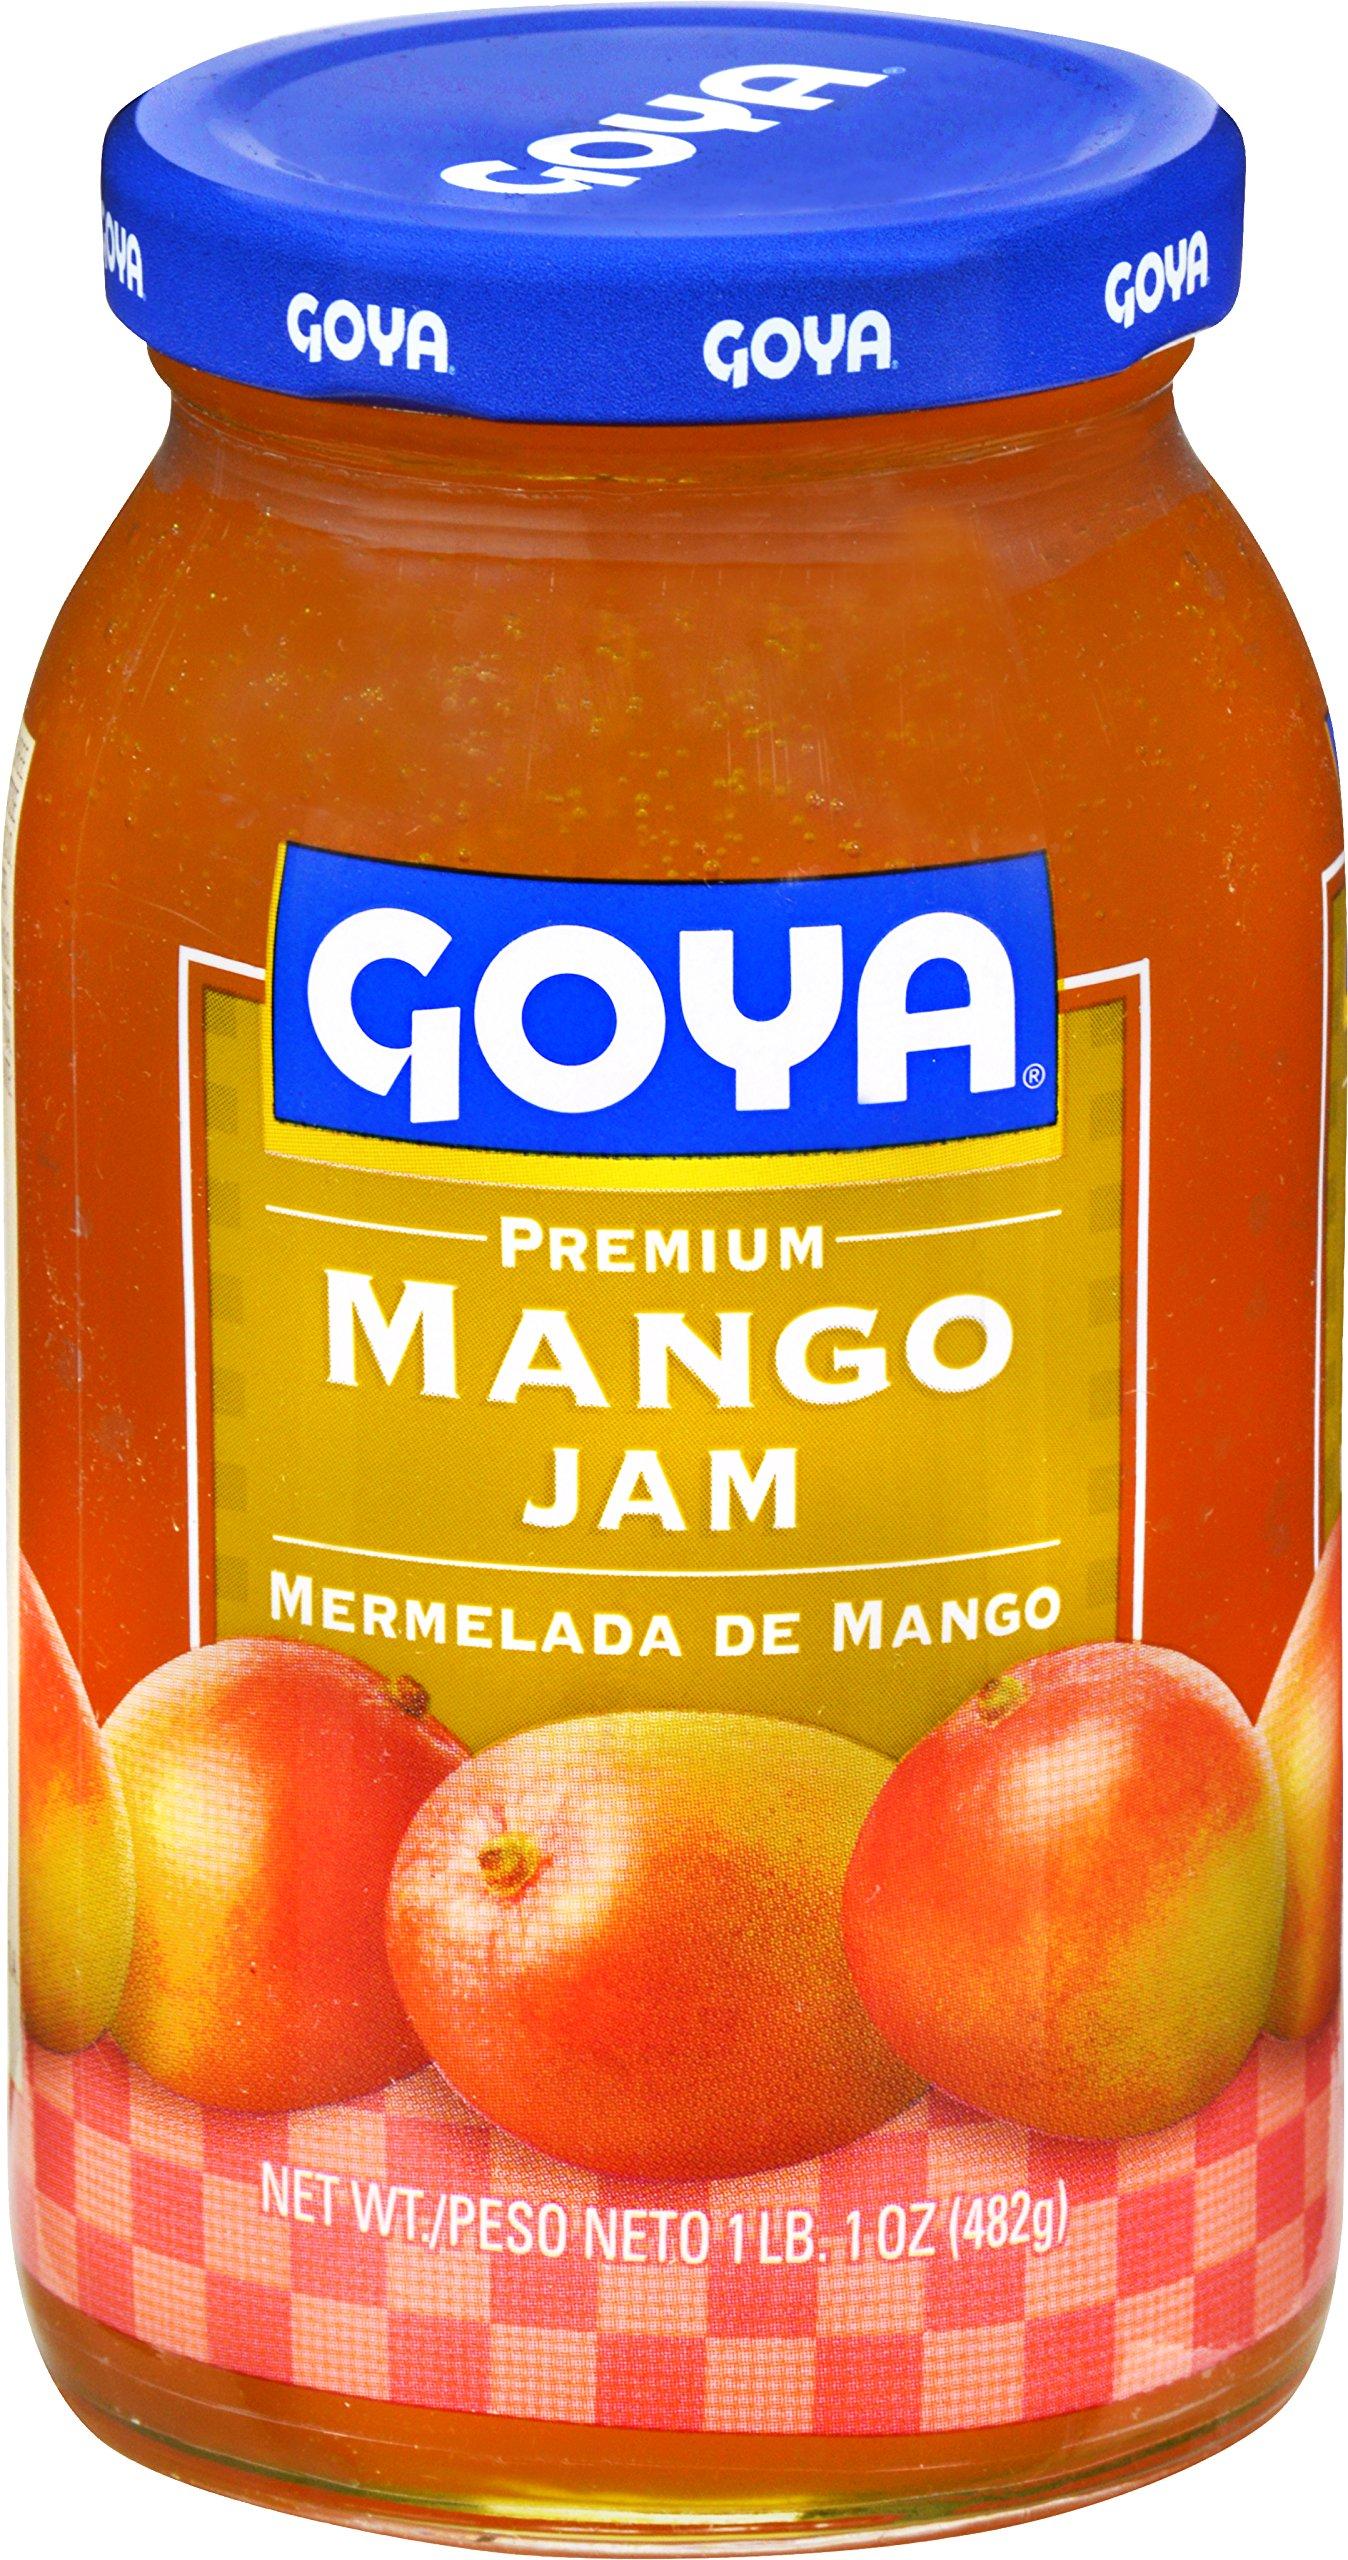 Goya Foods Premium Mango Jam, 17 Ounce (Pack of 12)